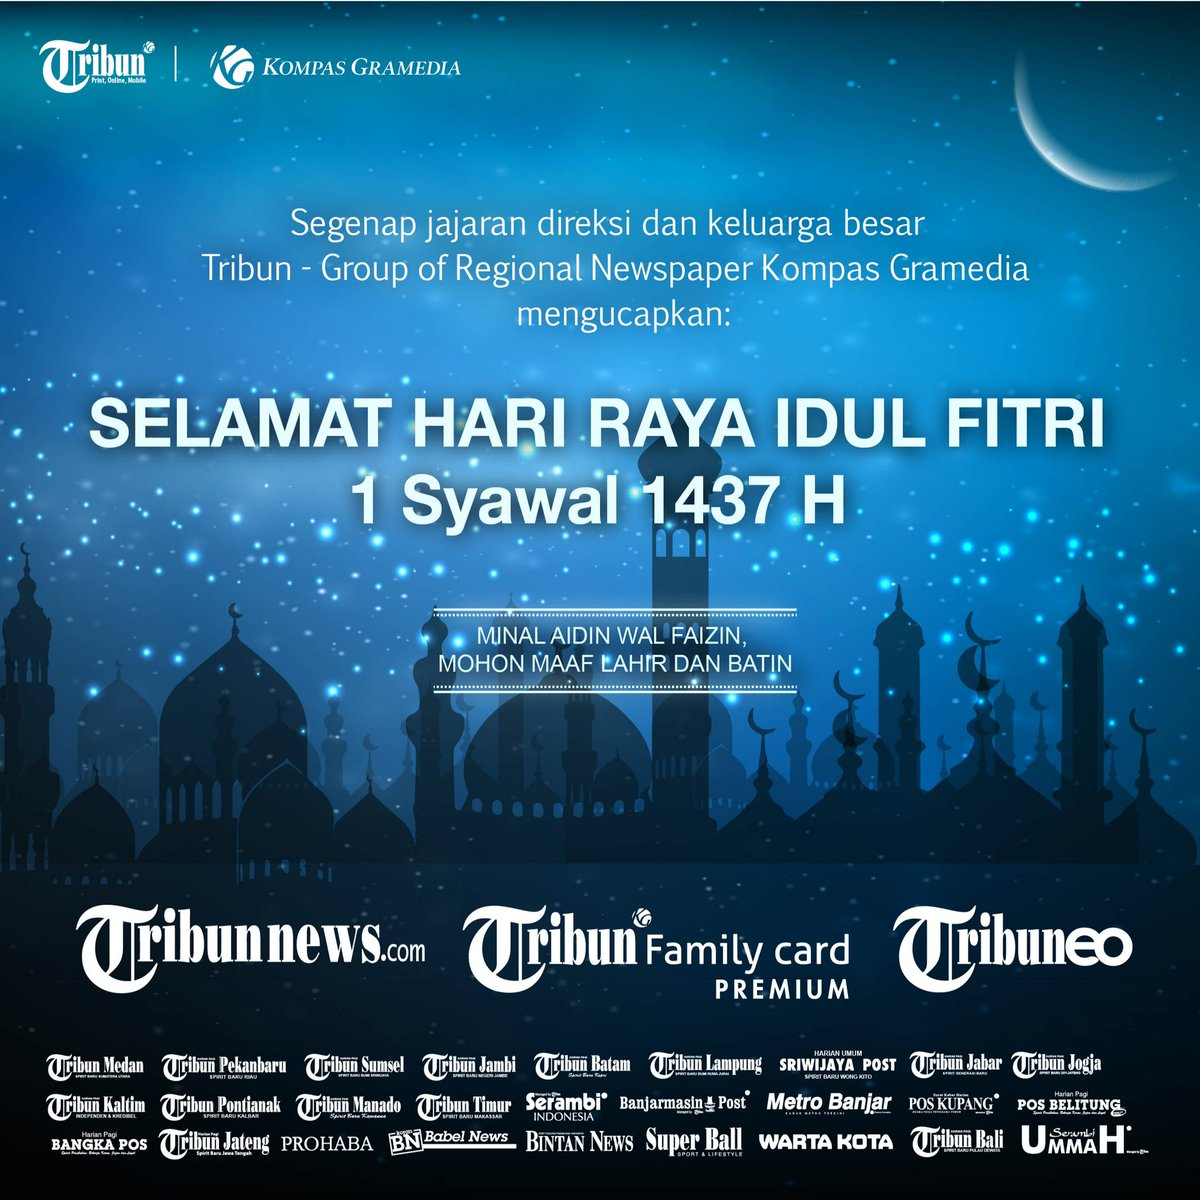 Tribun Family Card على تويتر Tribun Group Mengucapkan Selamat Idul Fitri 1 Syawal 1437 H Mohon Maaf Lahir Batin Cc Tribunnetwork